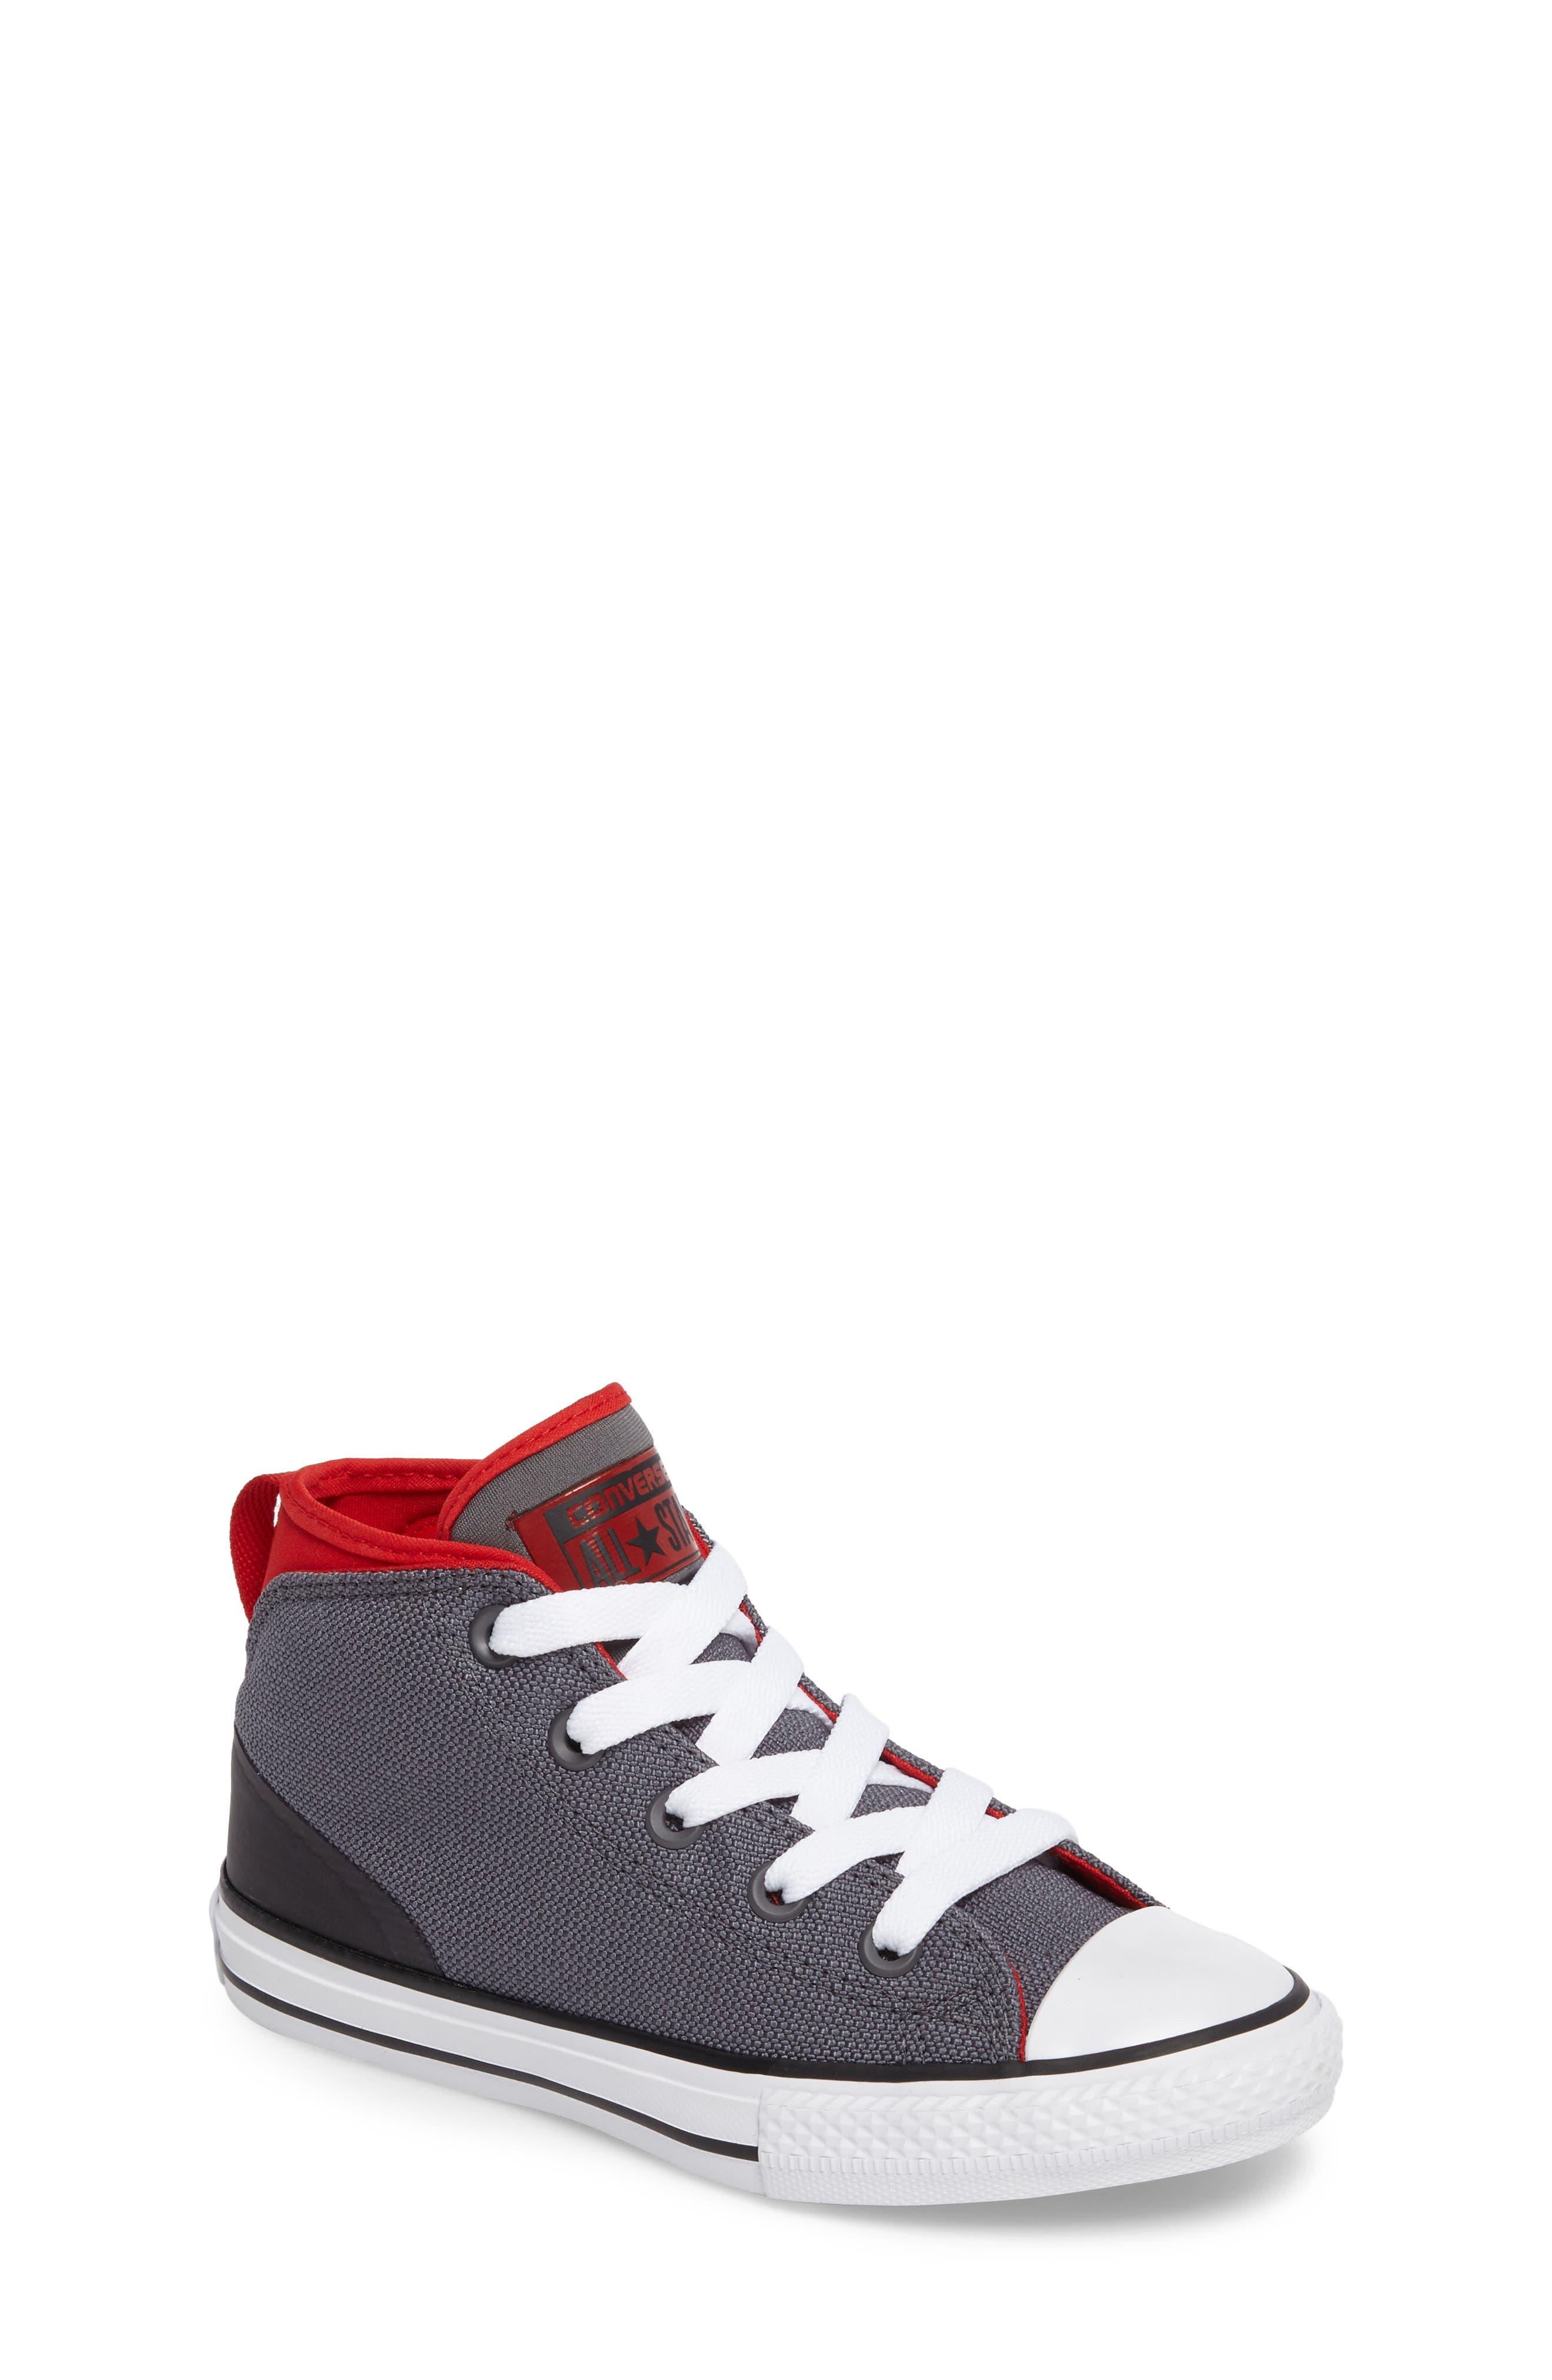 Converse Chuck Taylor® All Star® Syde Street High Top Sneaker (Baby, Walker, Toddler, Little Kid & Big Kid)